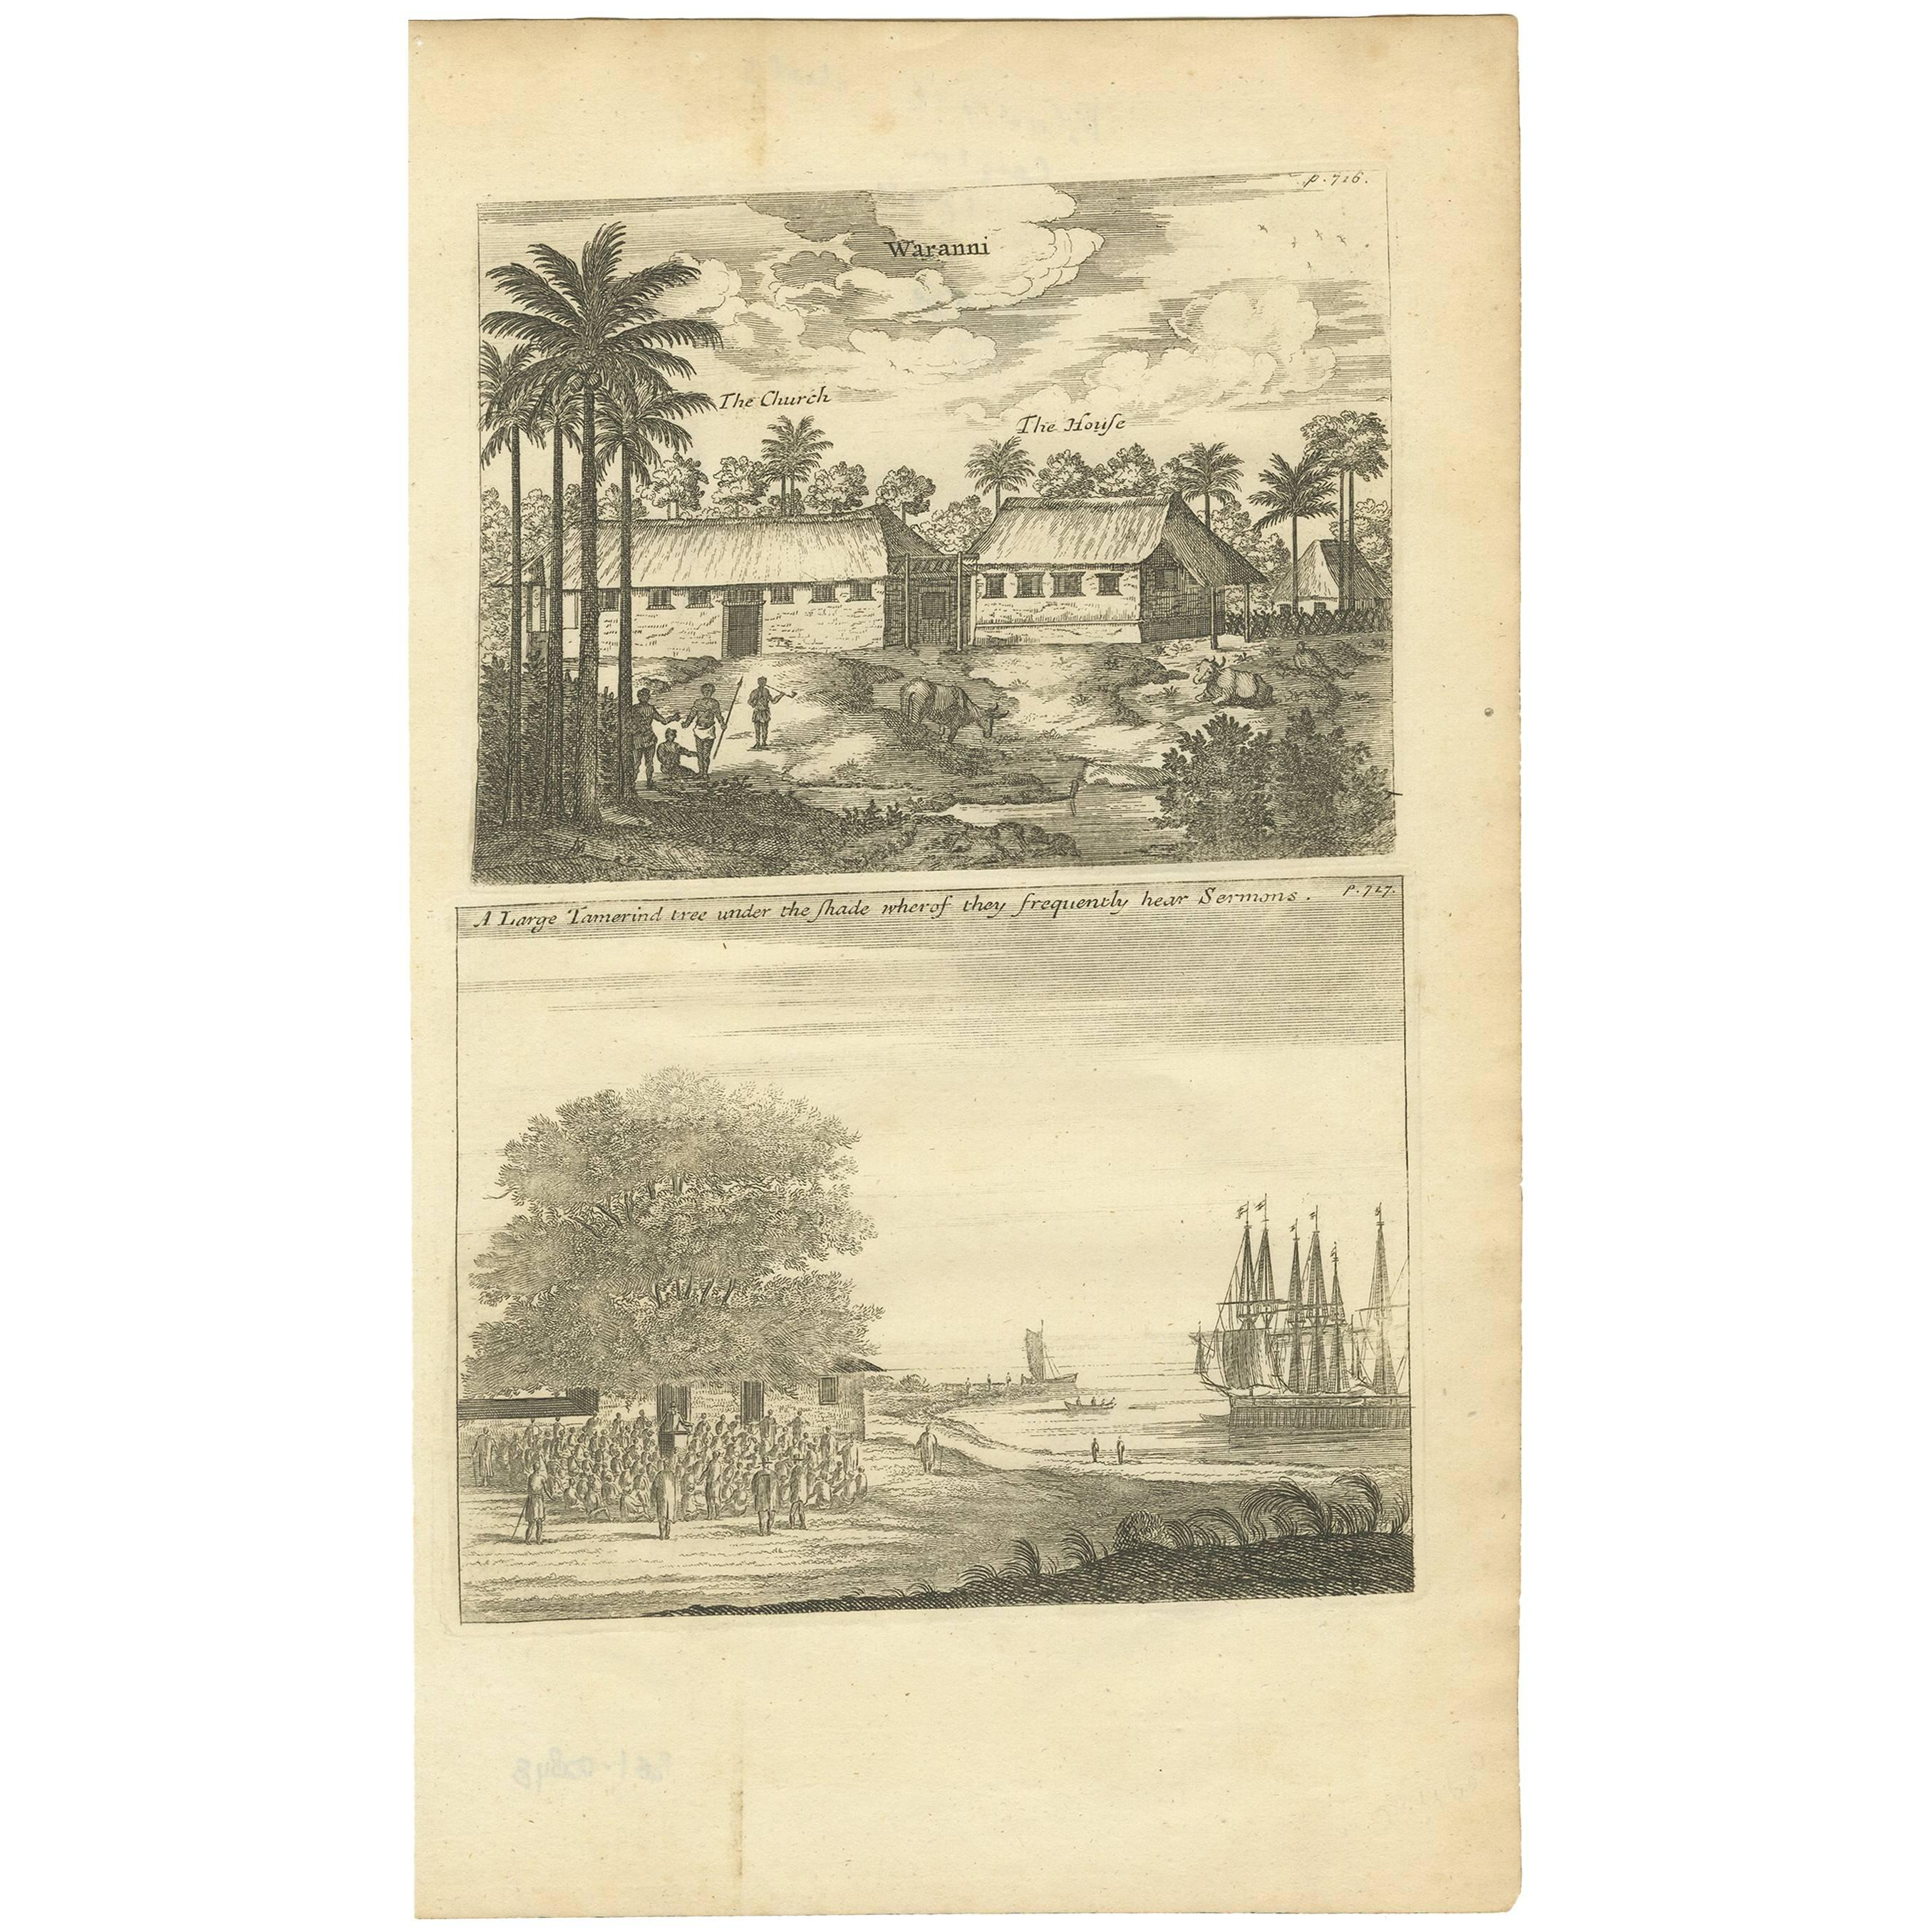 Antique Print of Waranni and a Tamarind Tree 'Ceylon, Sri Lanka'